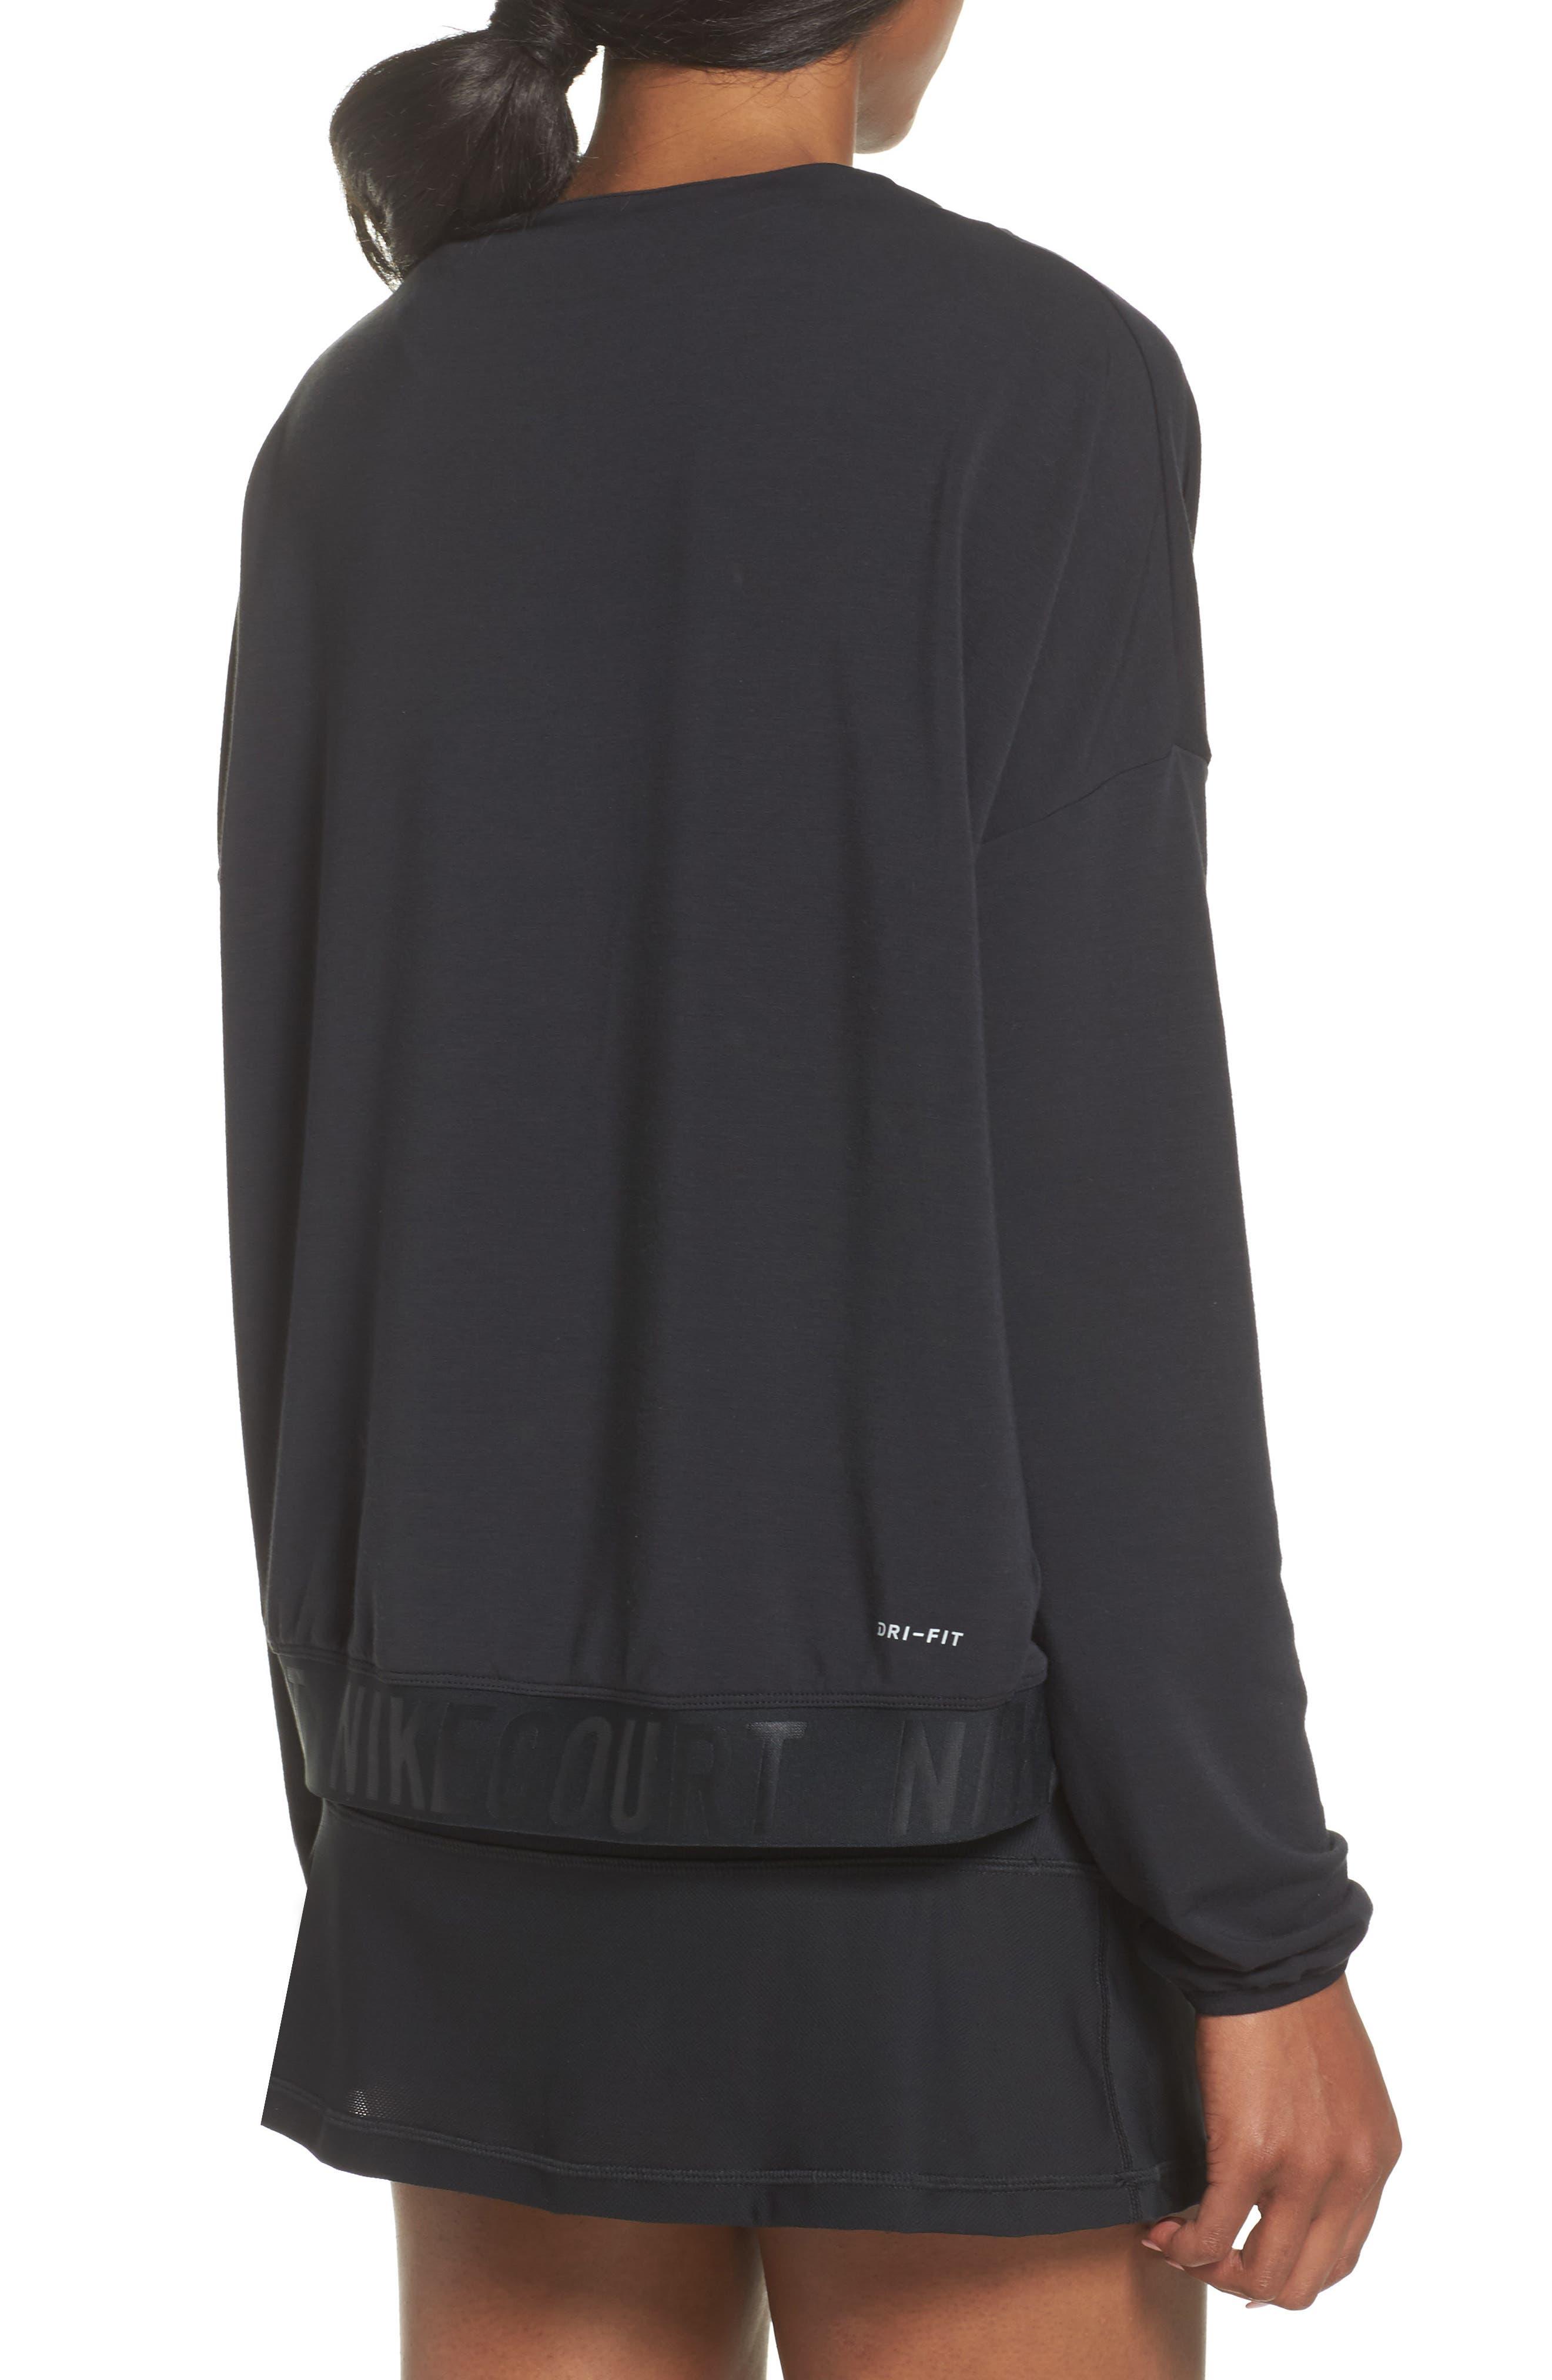 Court Dri-FIT Long Sleeve Tennis Top,                             Alternate thumbnail 2, color,                             Black/ White